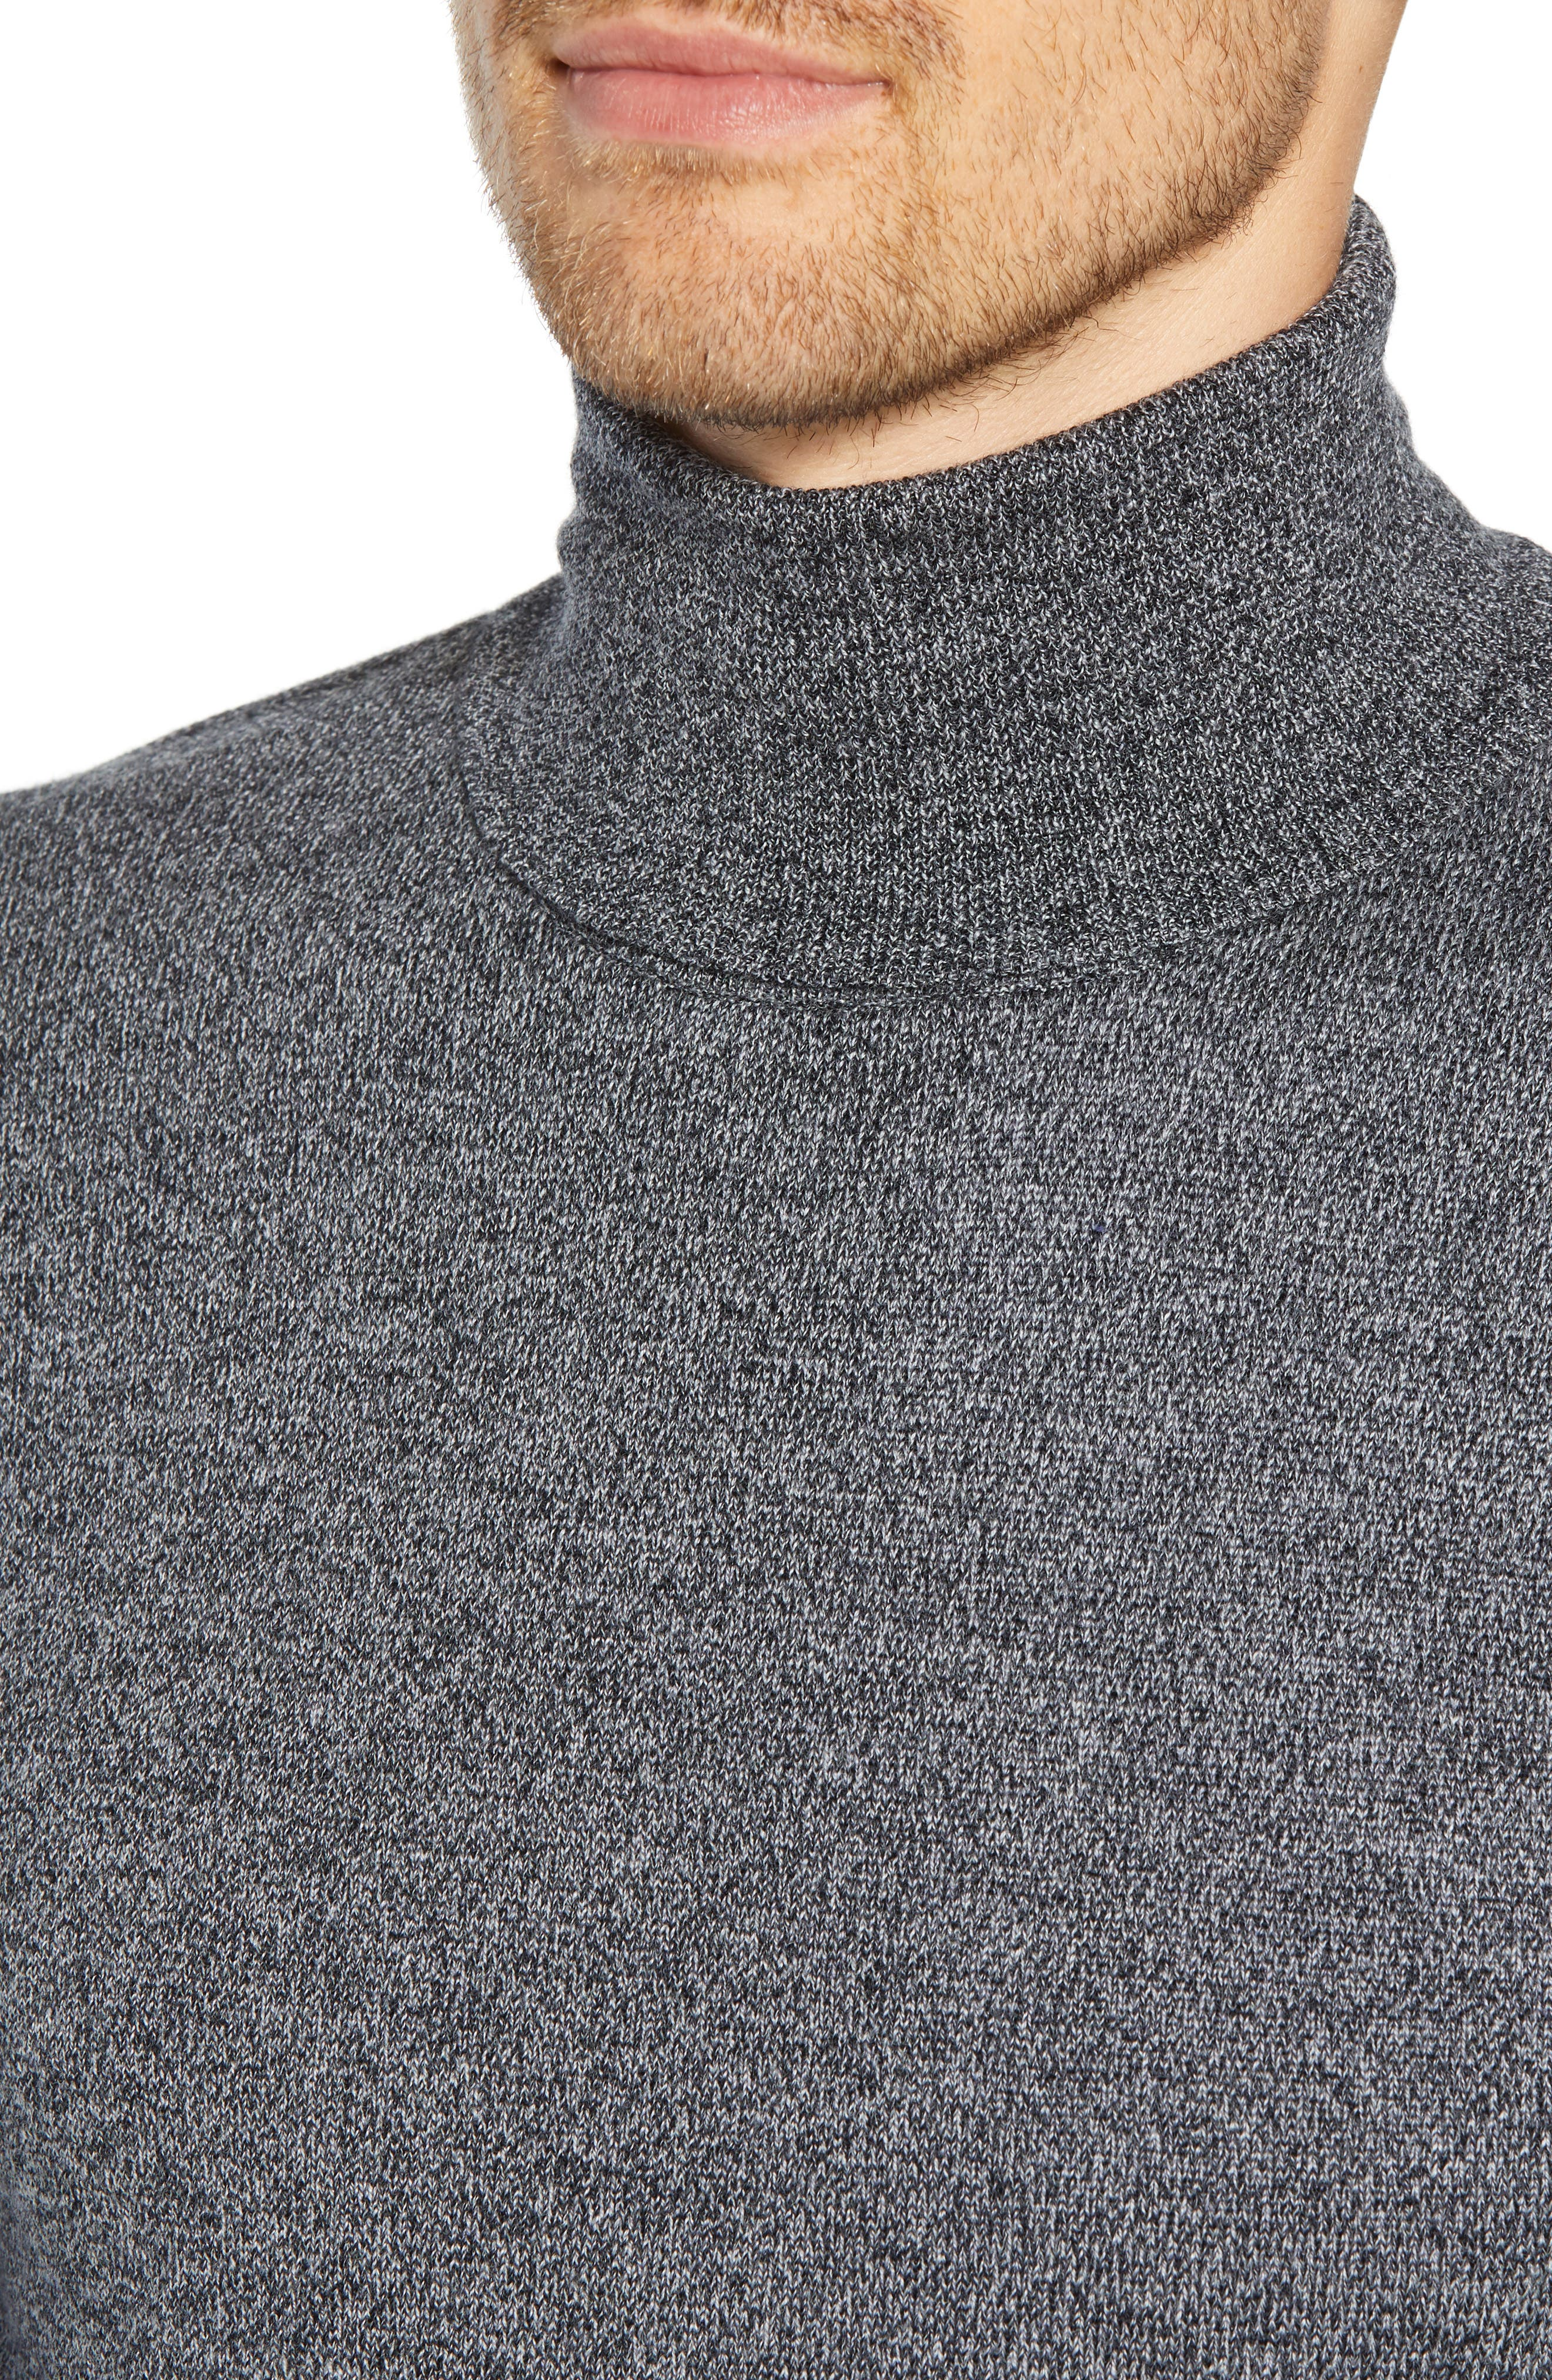 Slim Fit Turtleneck Merino Wool Sweater,                             Alternate thumbnail 4, color,                             CHARCOAL MARL